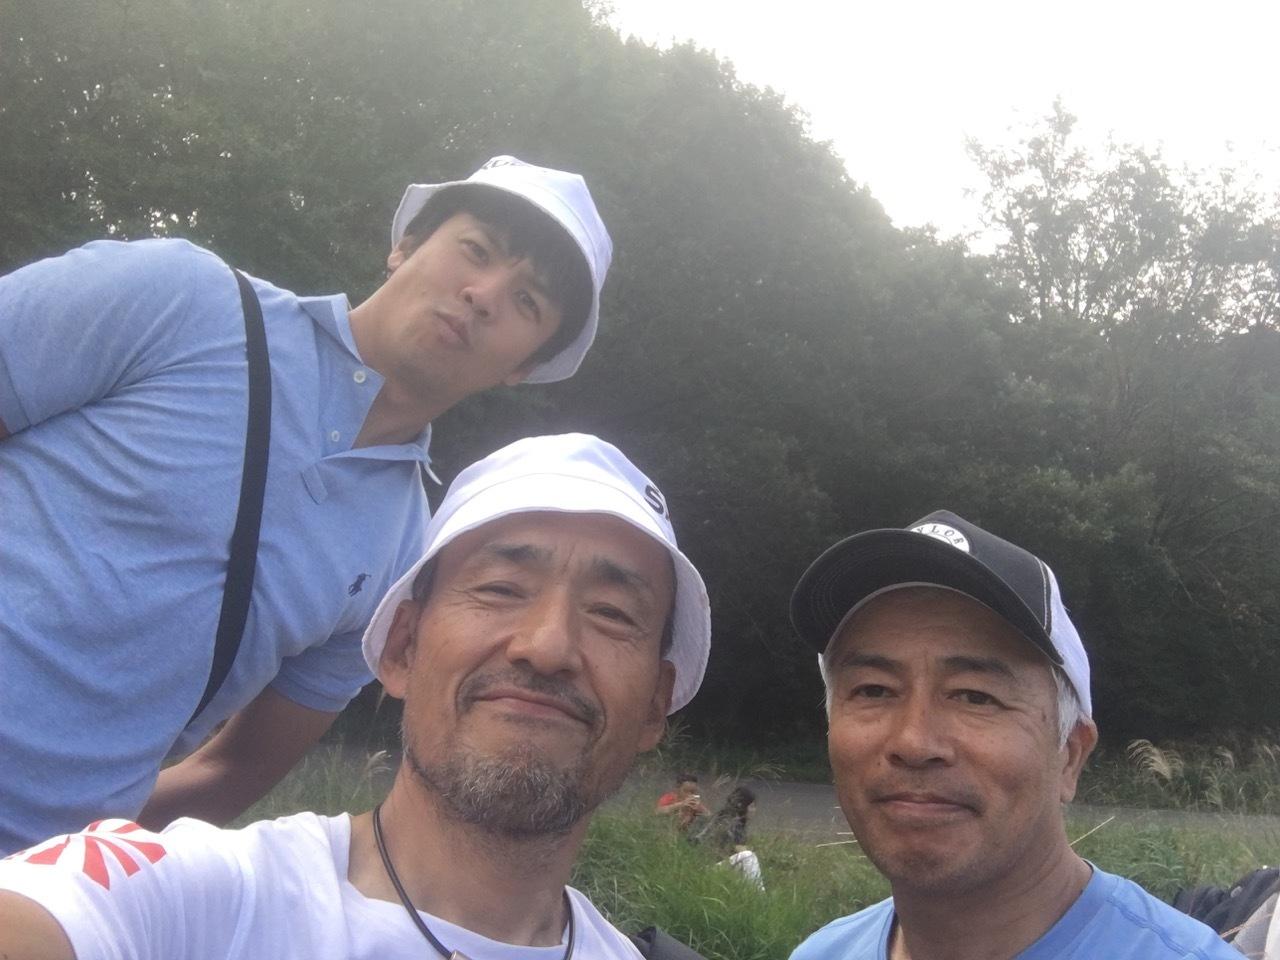 2019.10.06「READY STEADY TOKYO」_c0197974_05073770.jpg